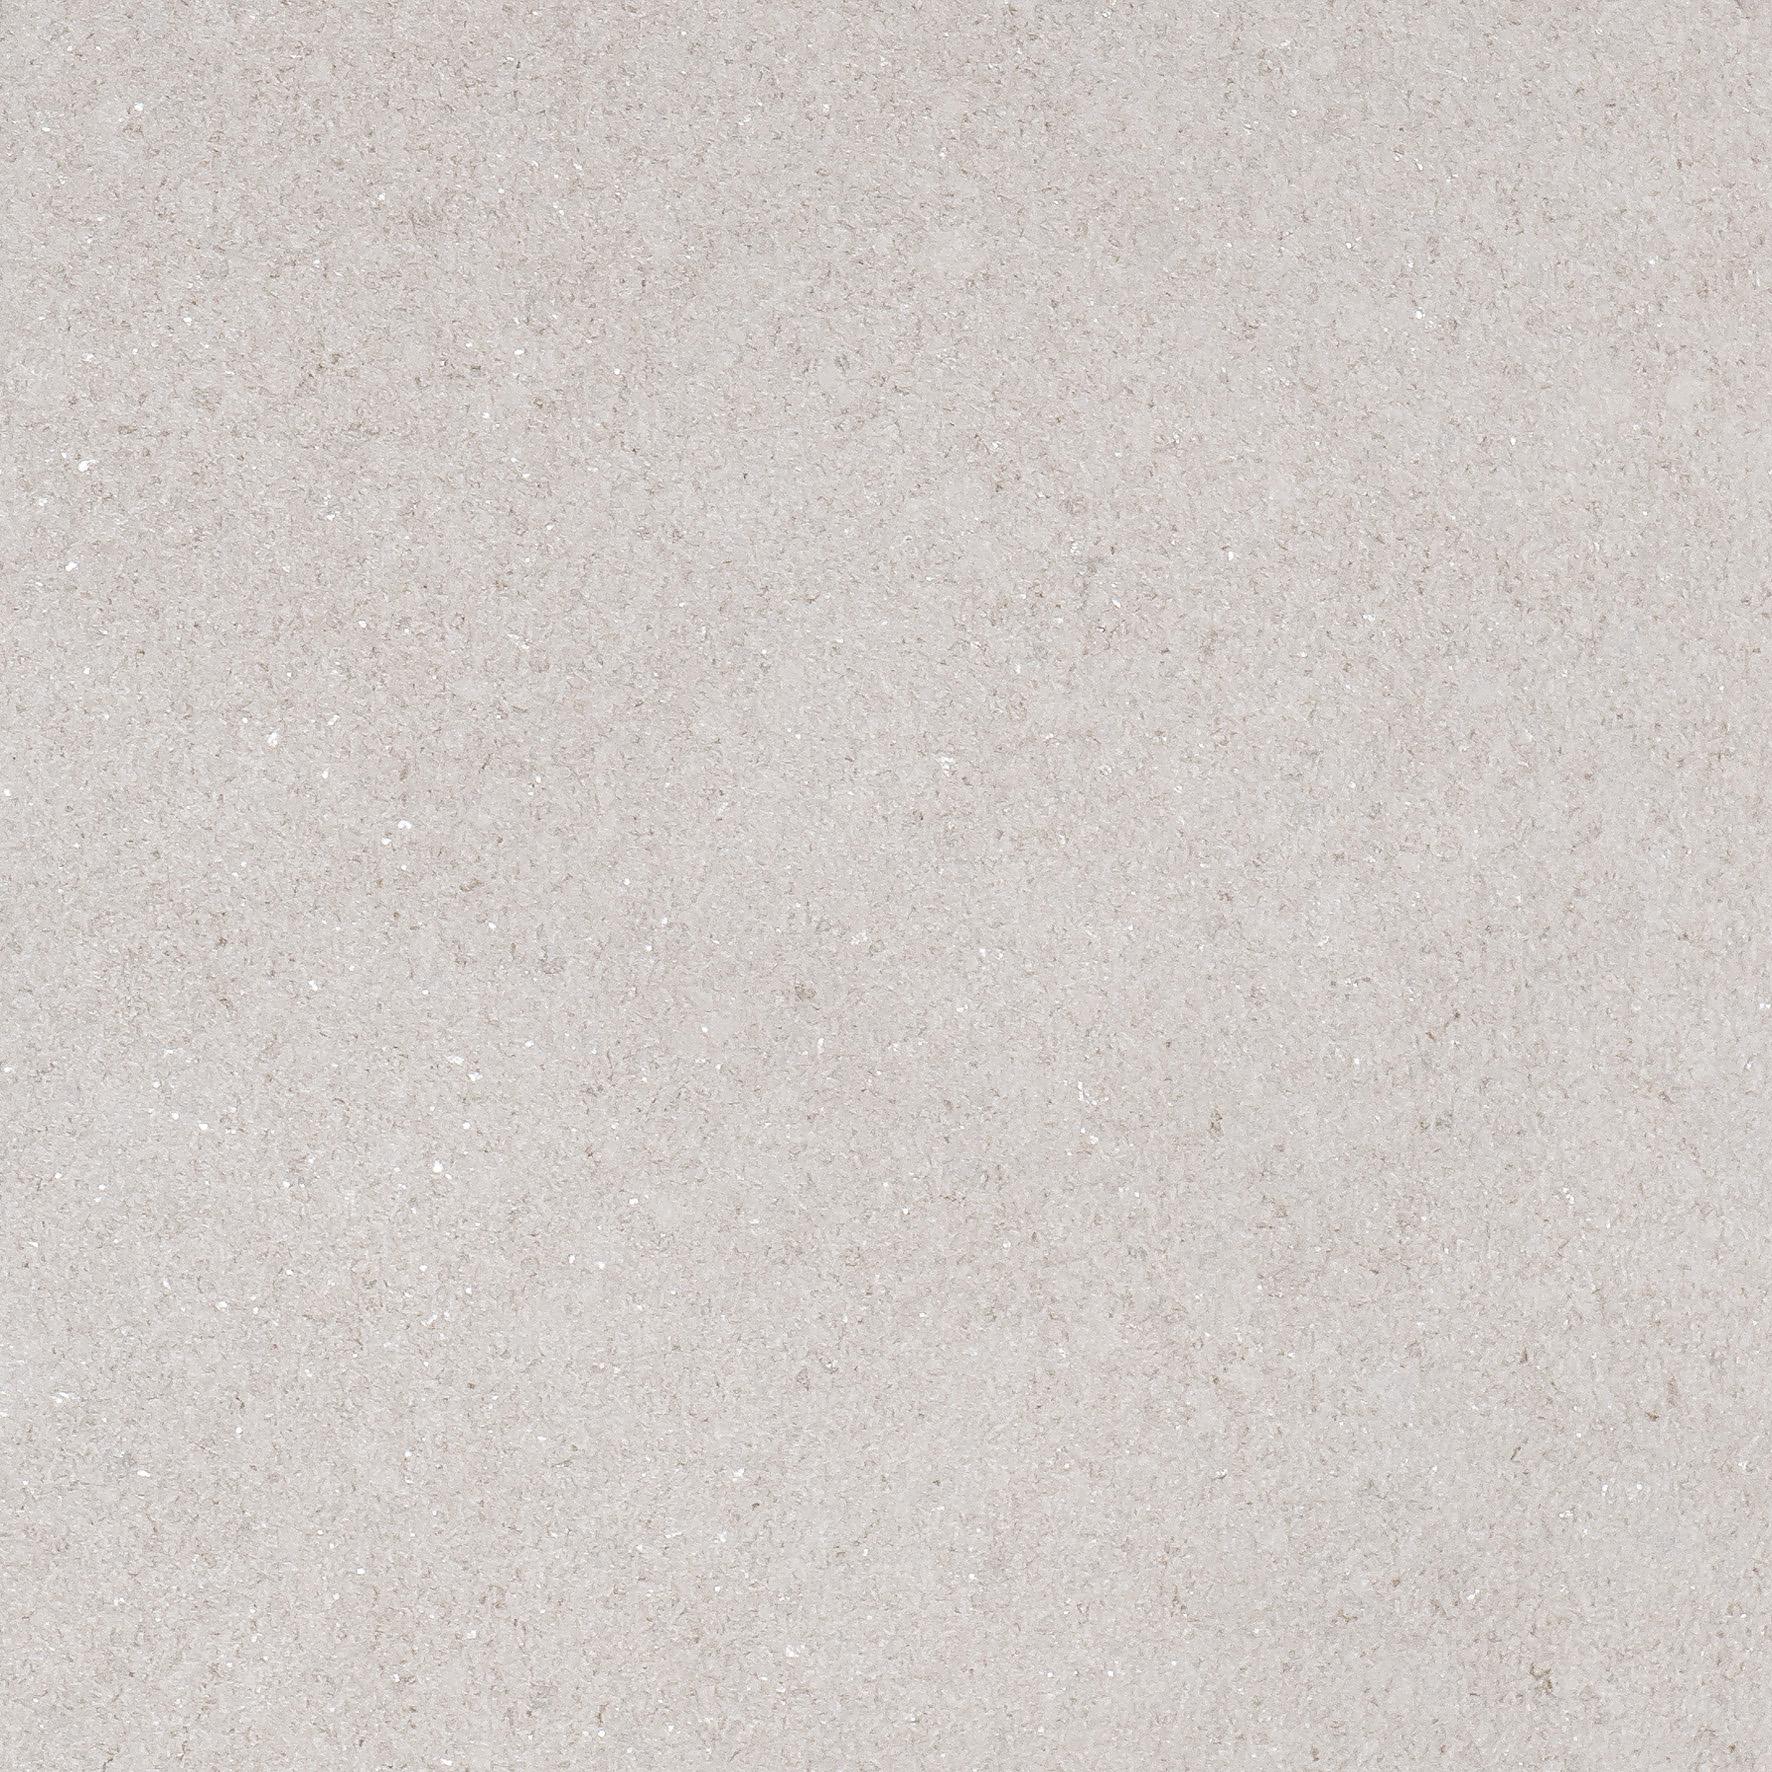 Klinker Bricmate J33 Stone Light Grey 30×30 cm